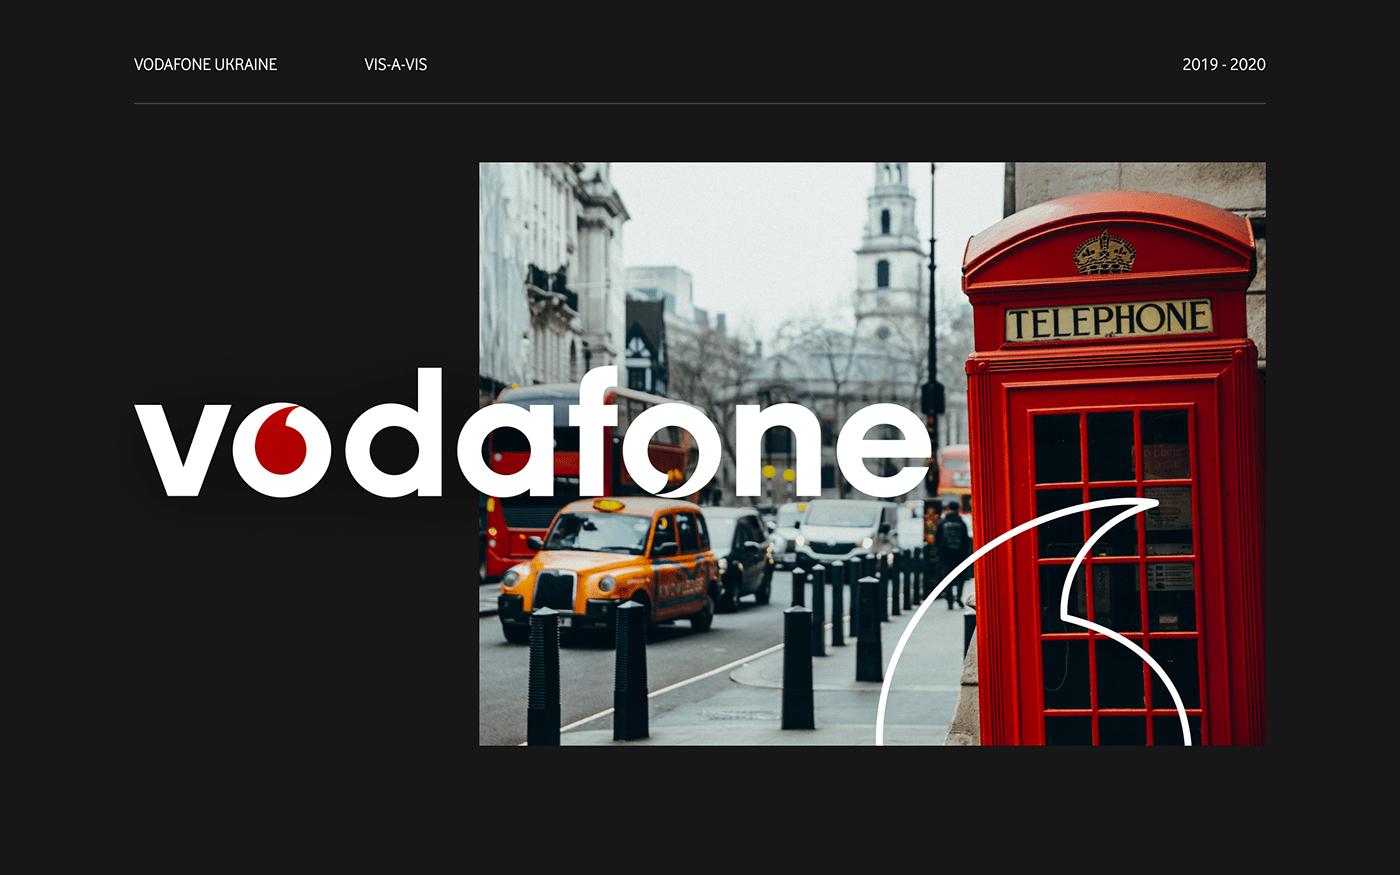 development Interface mobile operator site UI/UX vis-a-vis vodafone web-design